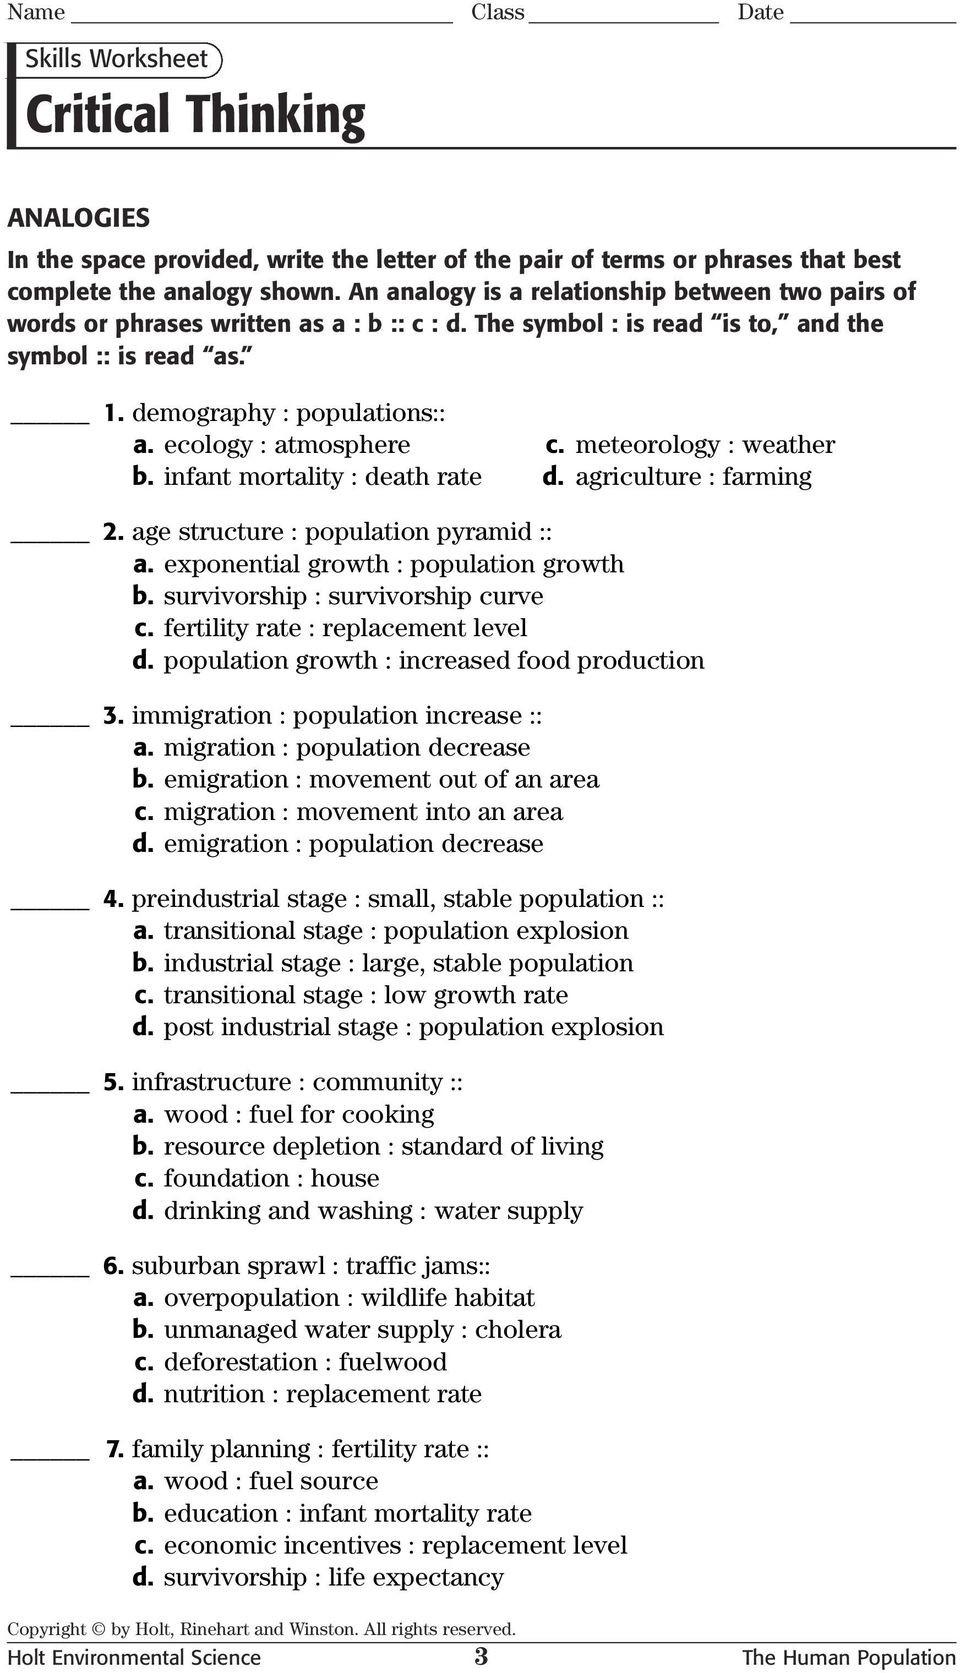 Critical Thinking Skills Worksheet